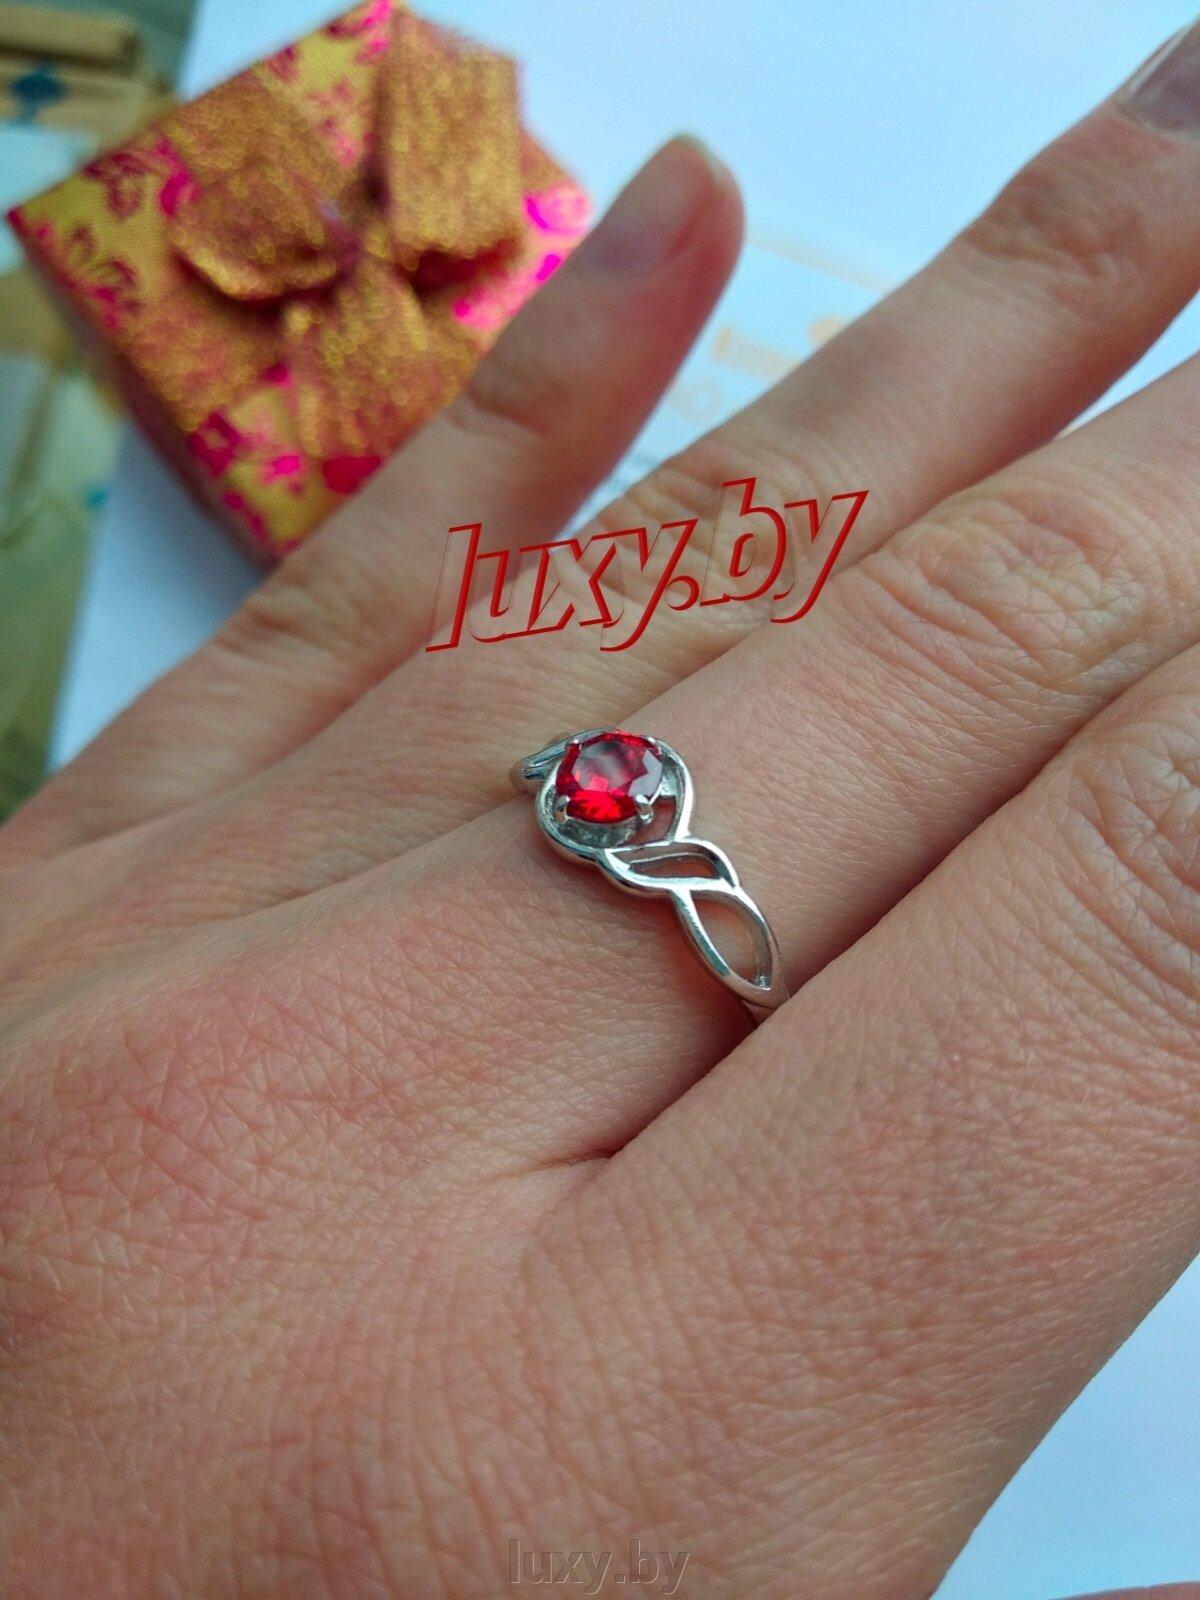 Кольцо серебрение Красная пресня, арт.24810004ДГр - фото pic_3a639f158eedc47c9ab5da1f4200c669_1920x9000_1.jpg